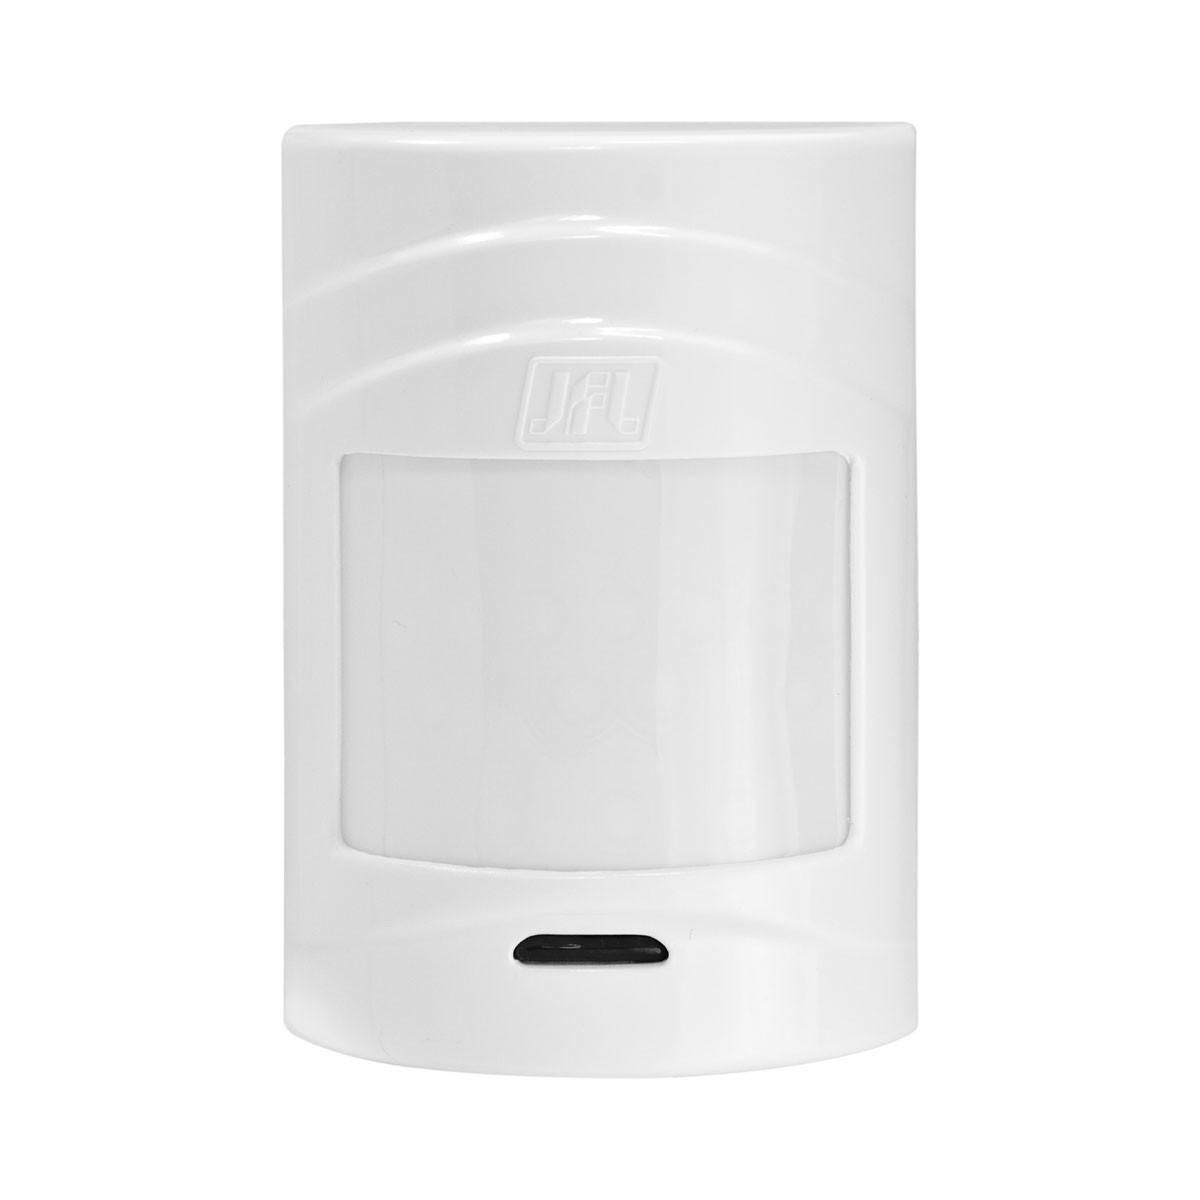 Kit Alarme Jfl Active 20 Ethernet Sensores Sem Fio IrPet 530Sf